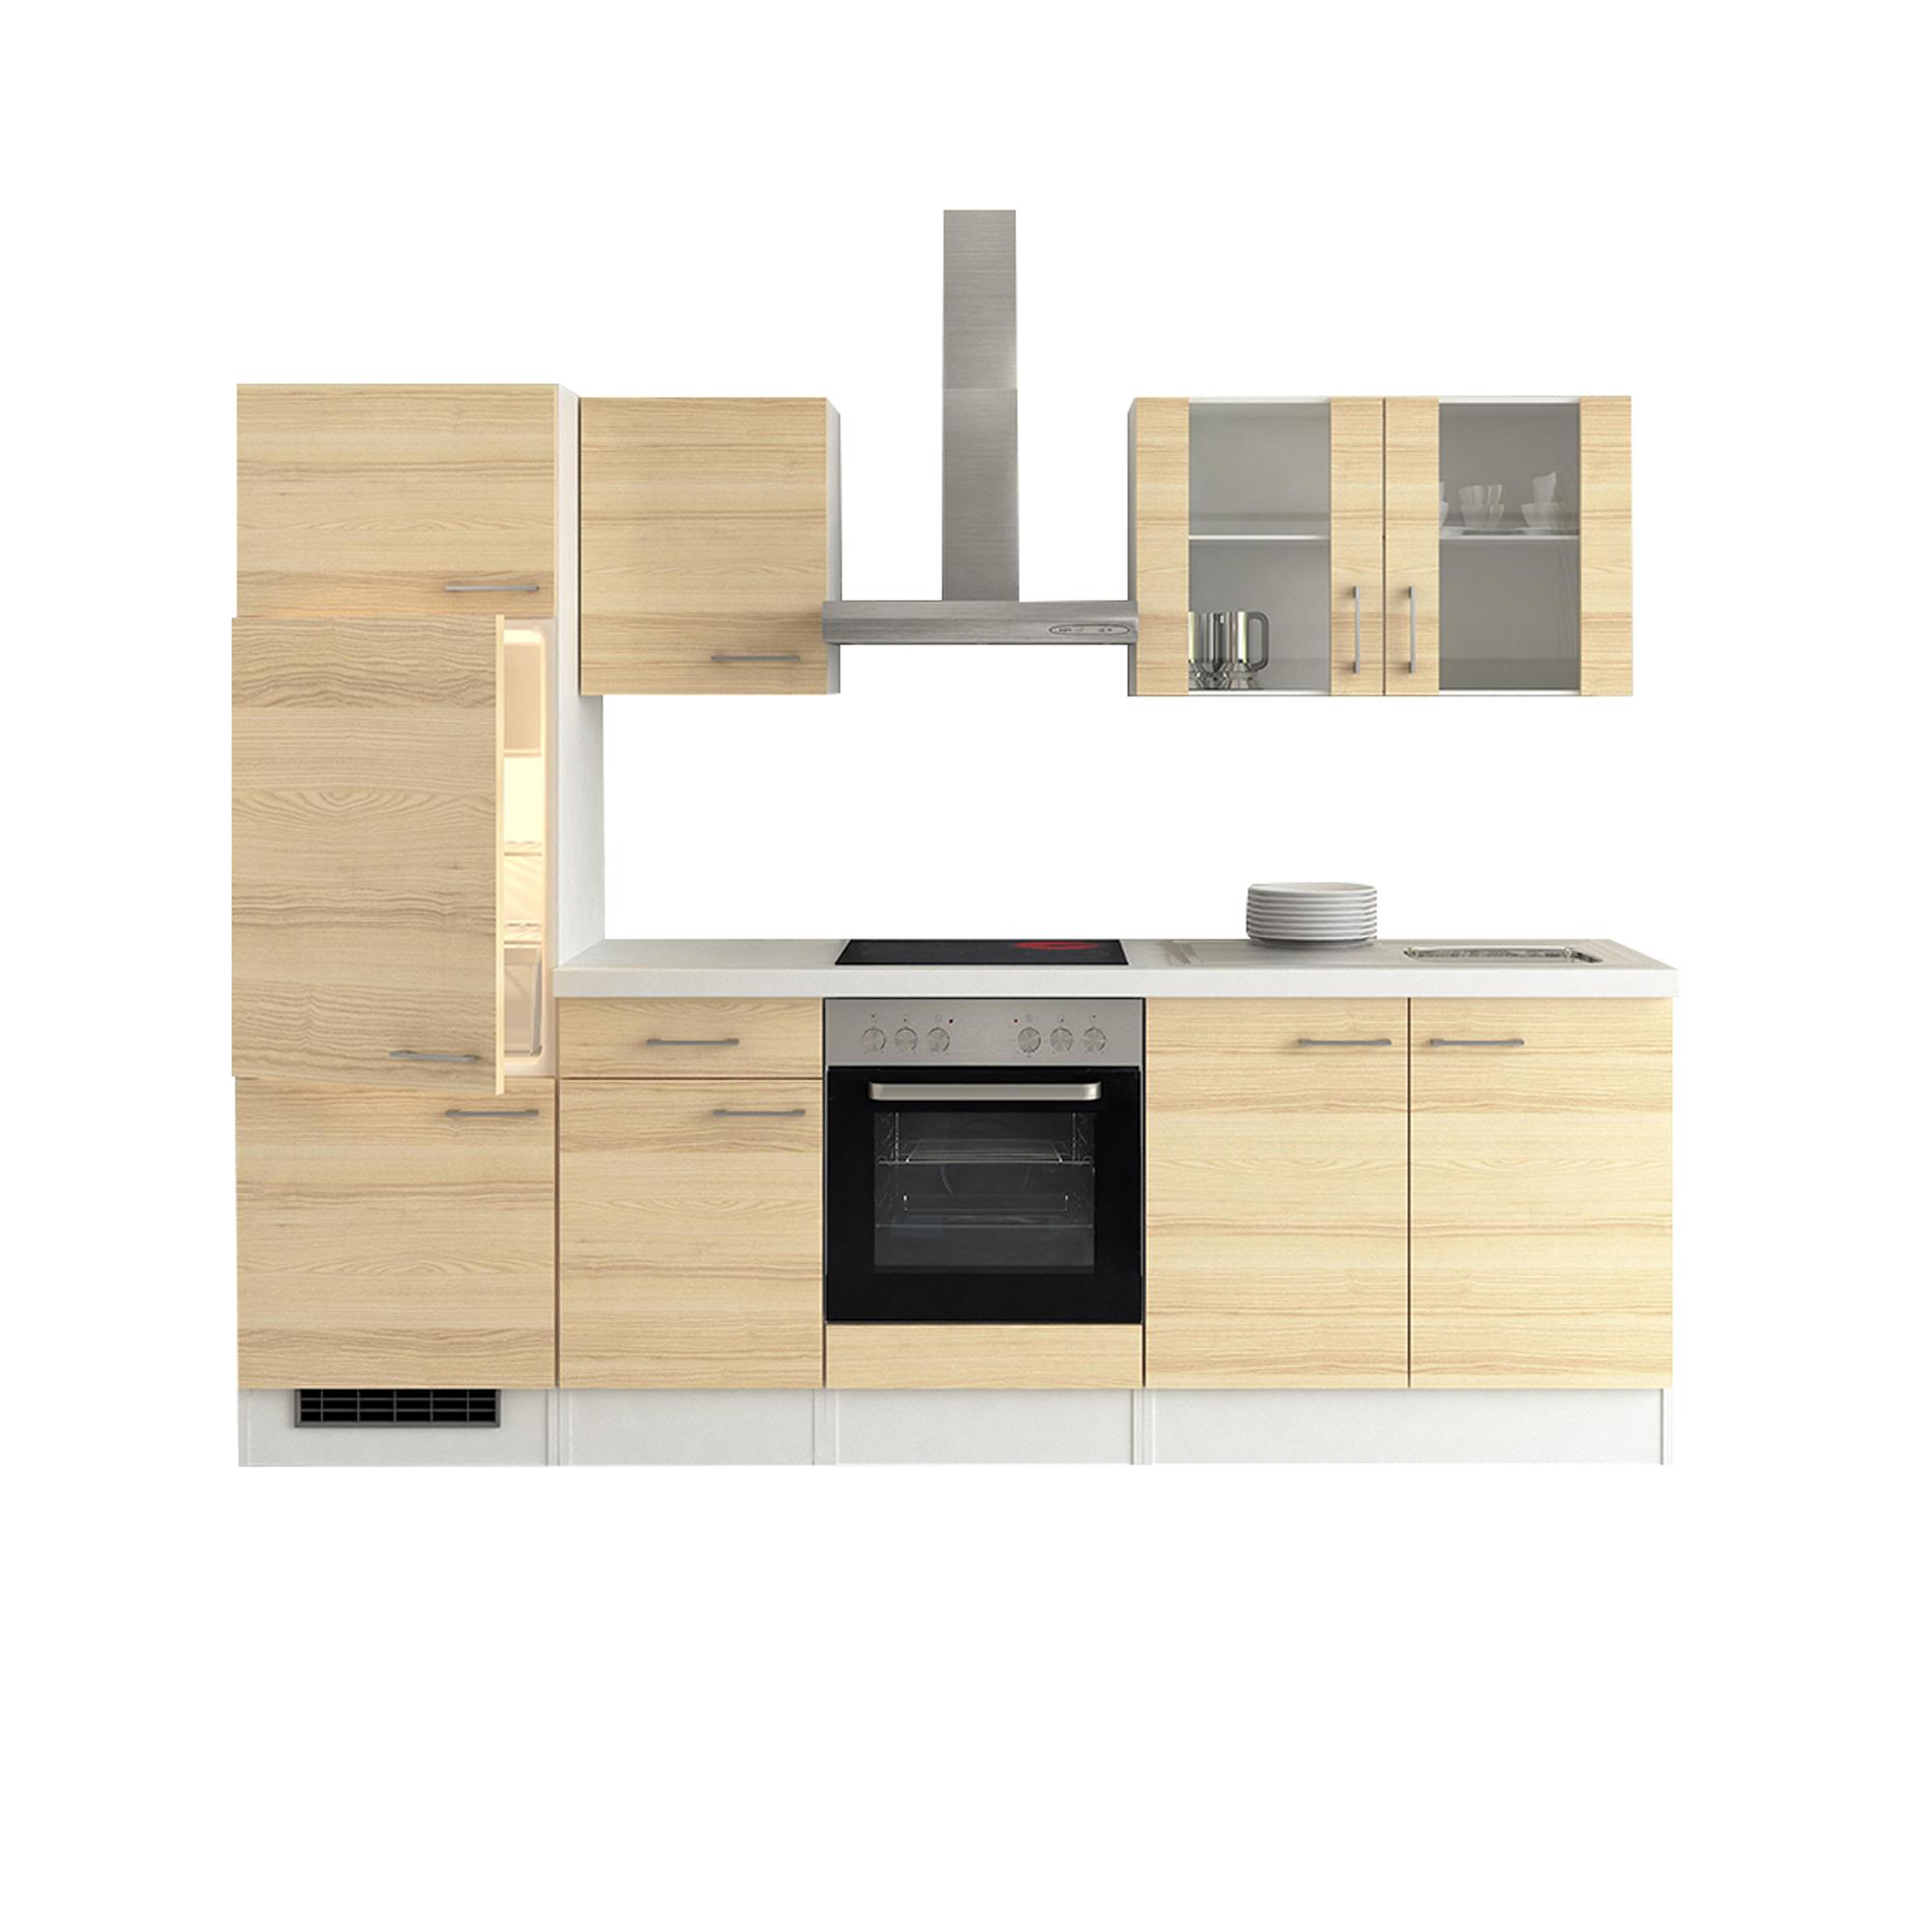 k chenzeile akazia k che mit e ger ten 12 teilig. Black Bedroom Furniture Sets. Home Design Ideas